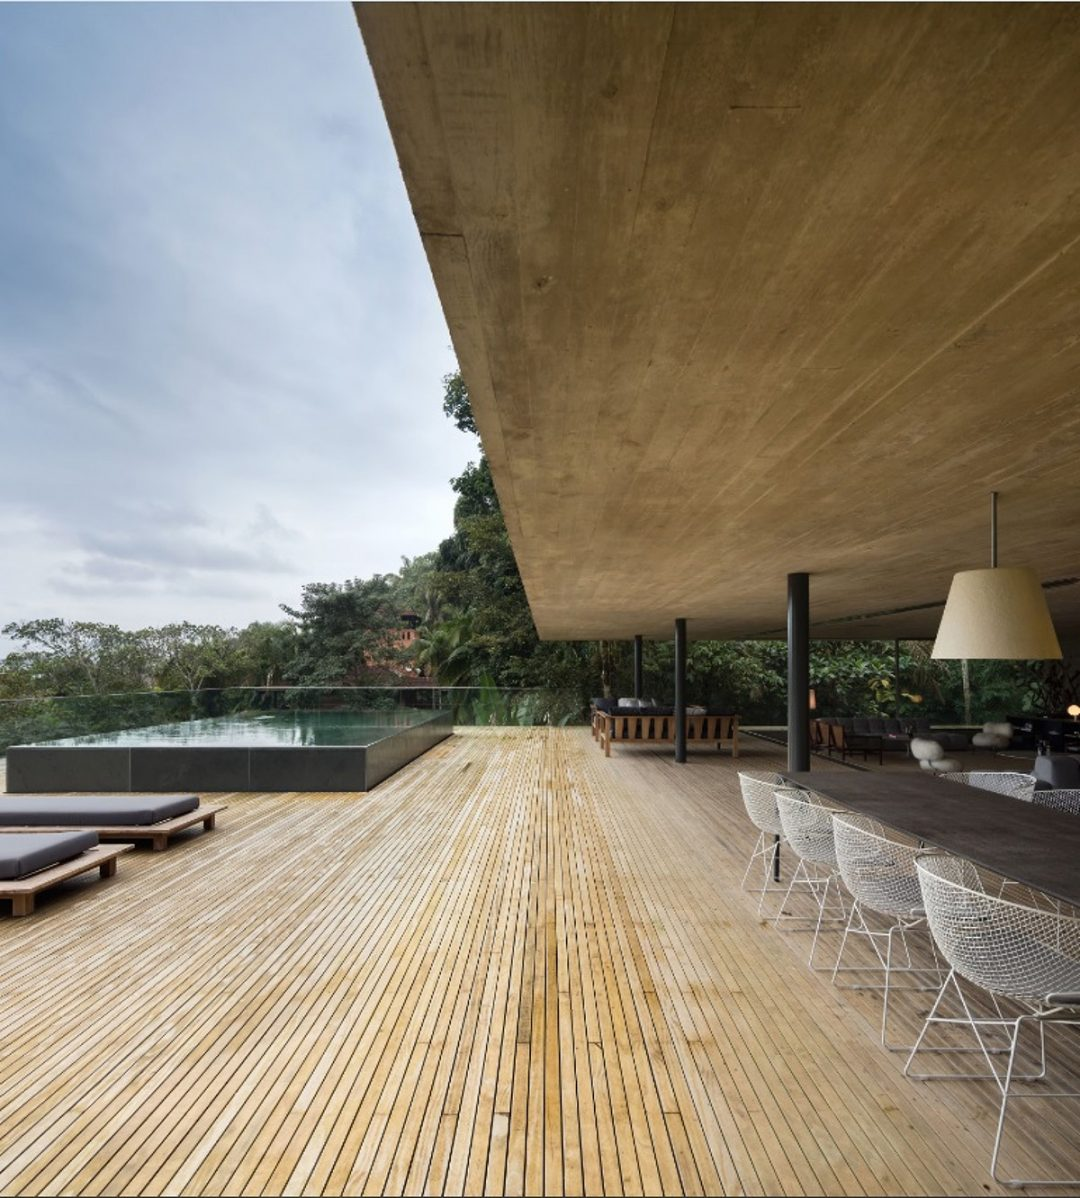 Accoya® was chosen for numerous features throughout this stunning Casa da Mata beach house